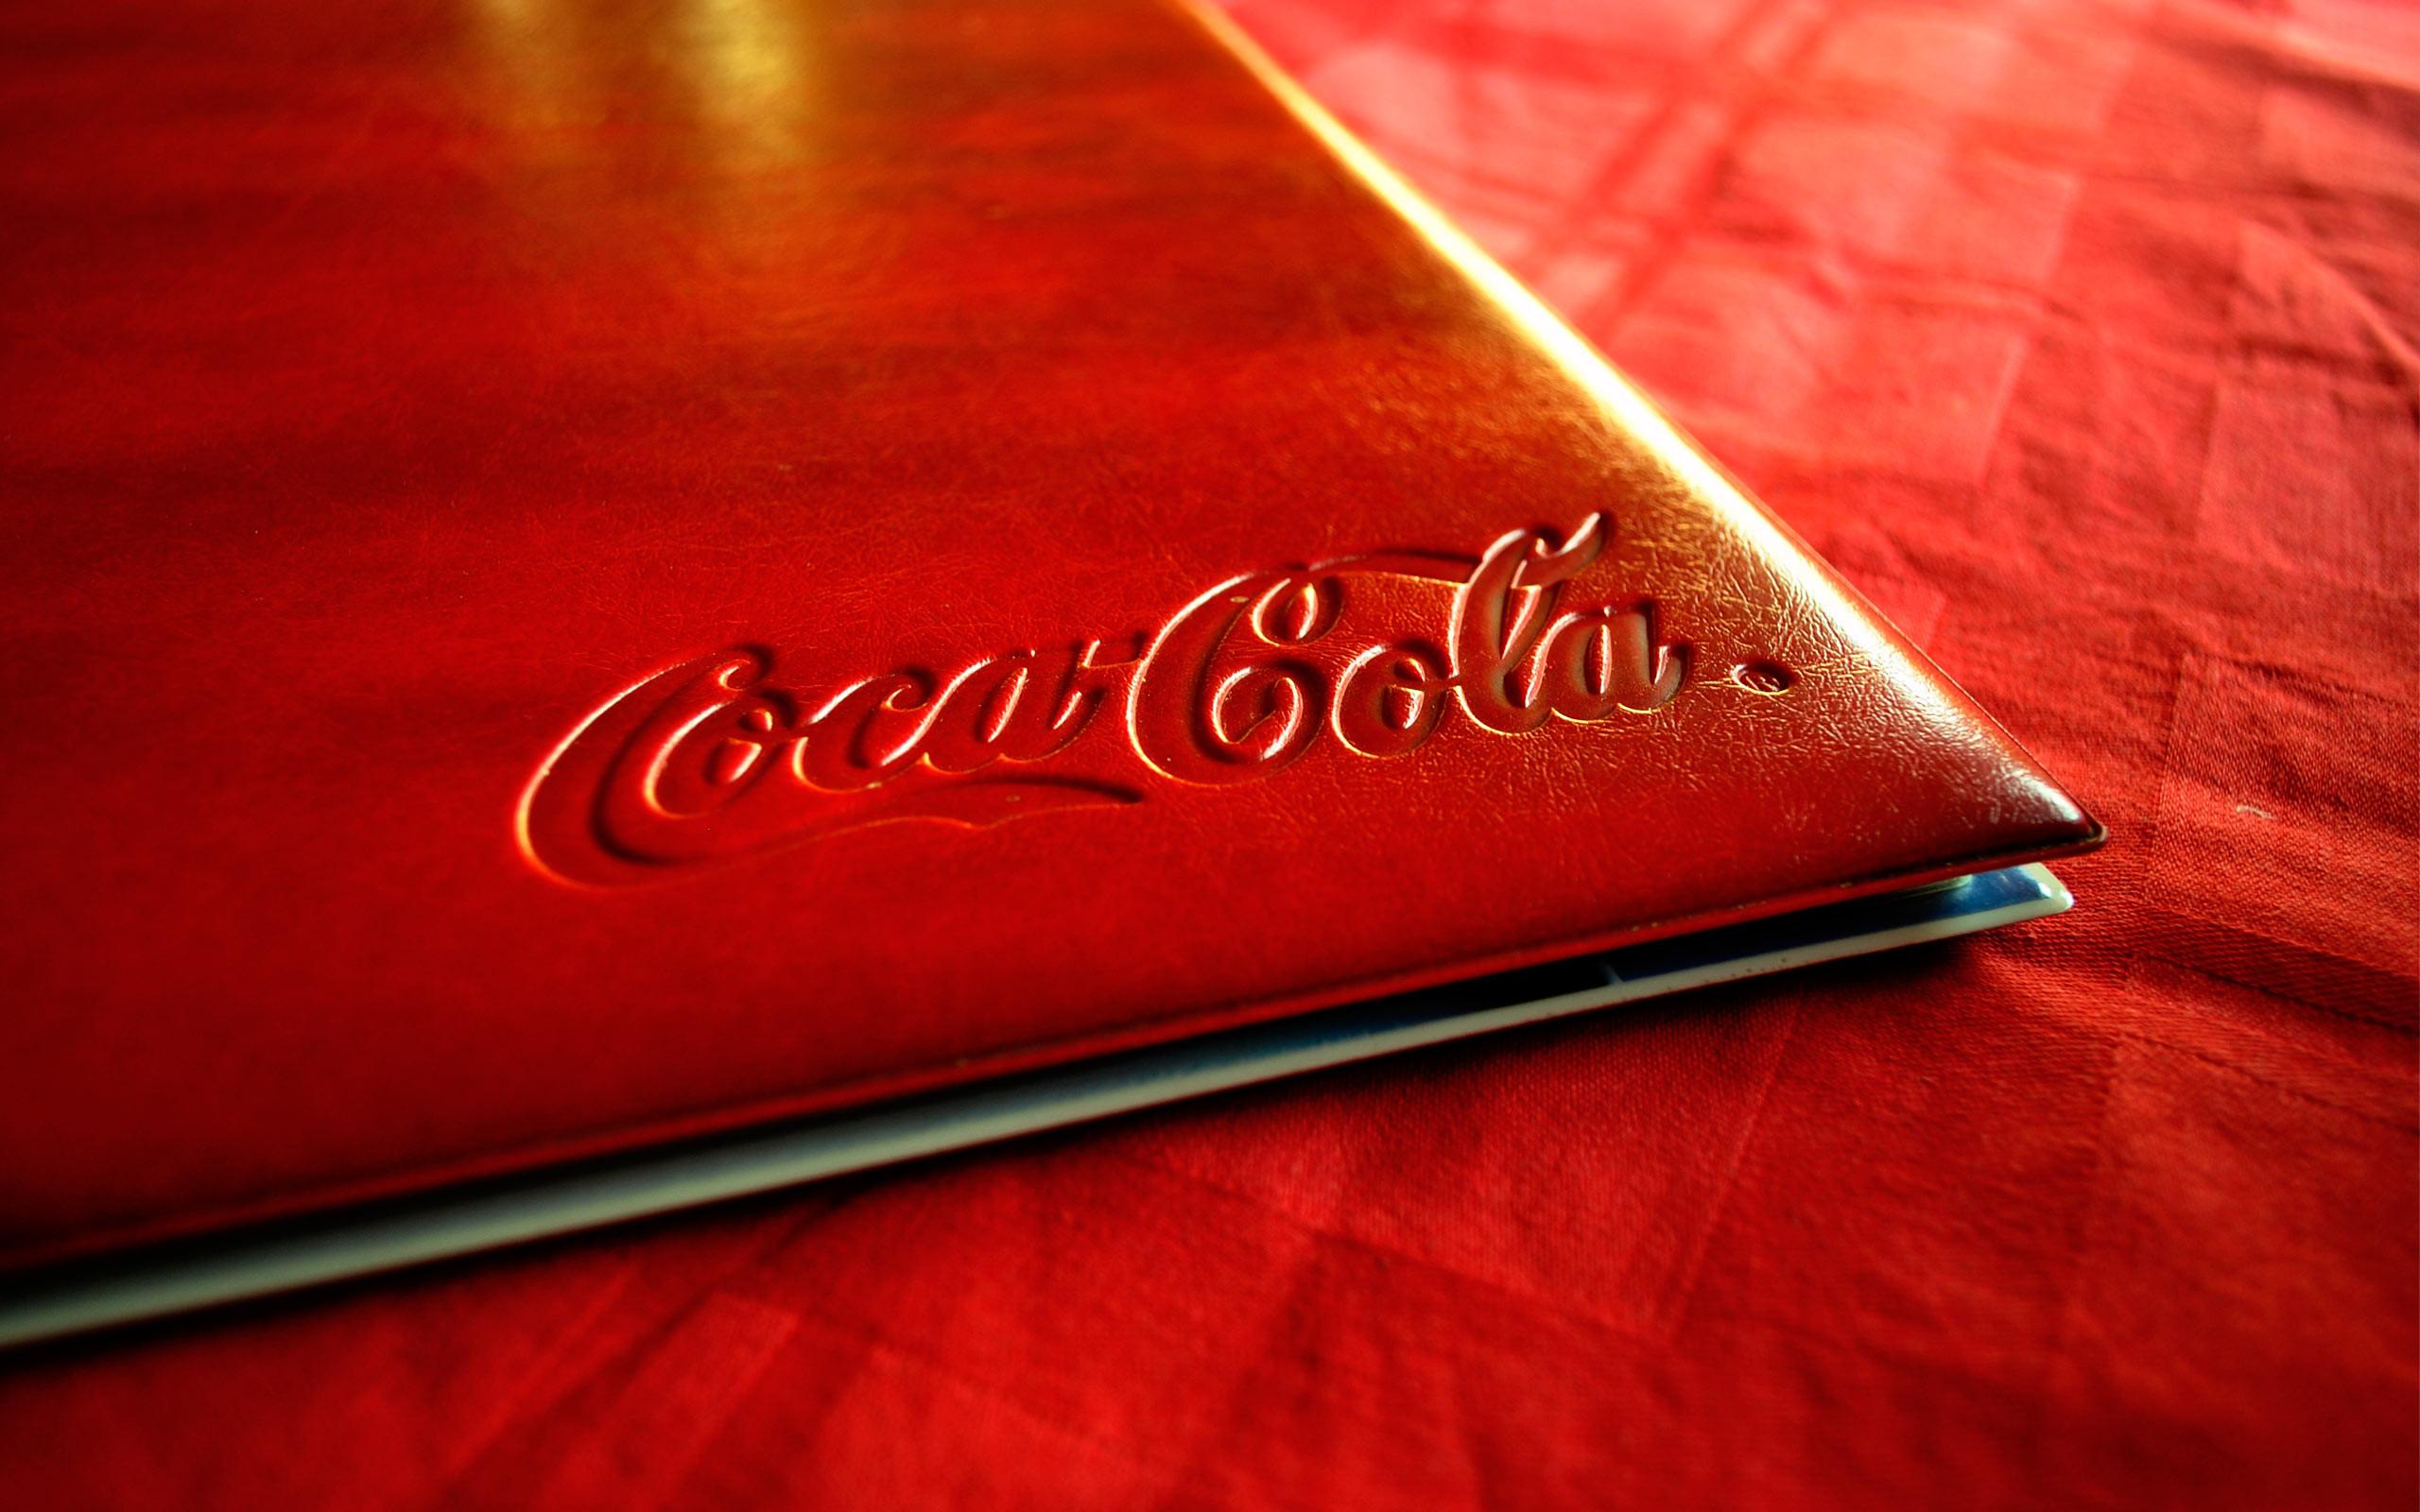 Free Wallpapers – Coca Cola Logo Notebook wallpaper